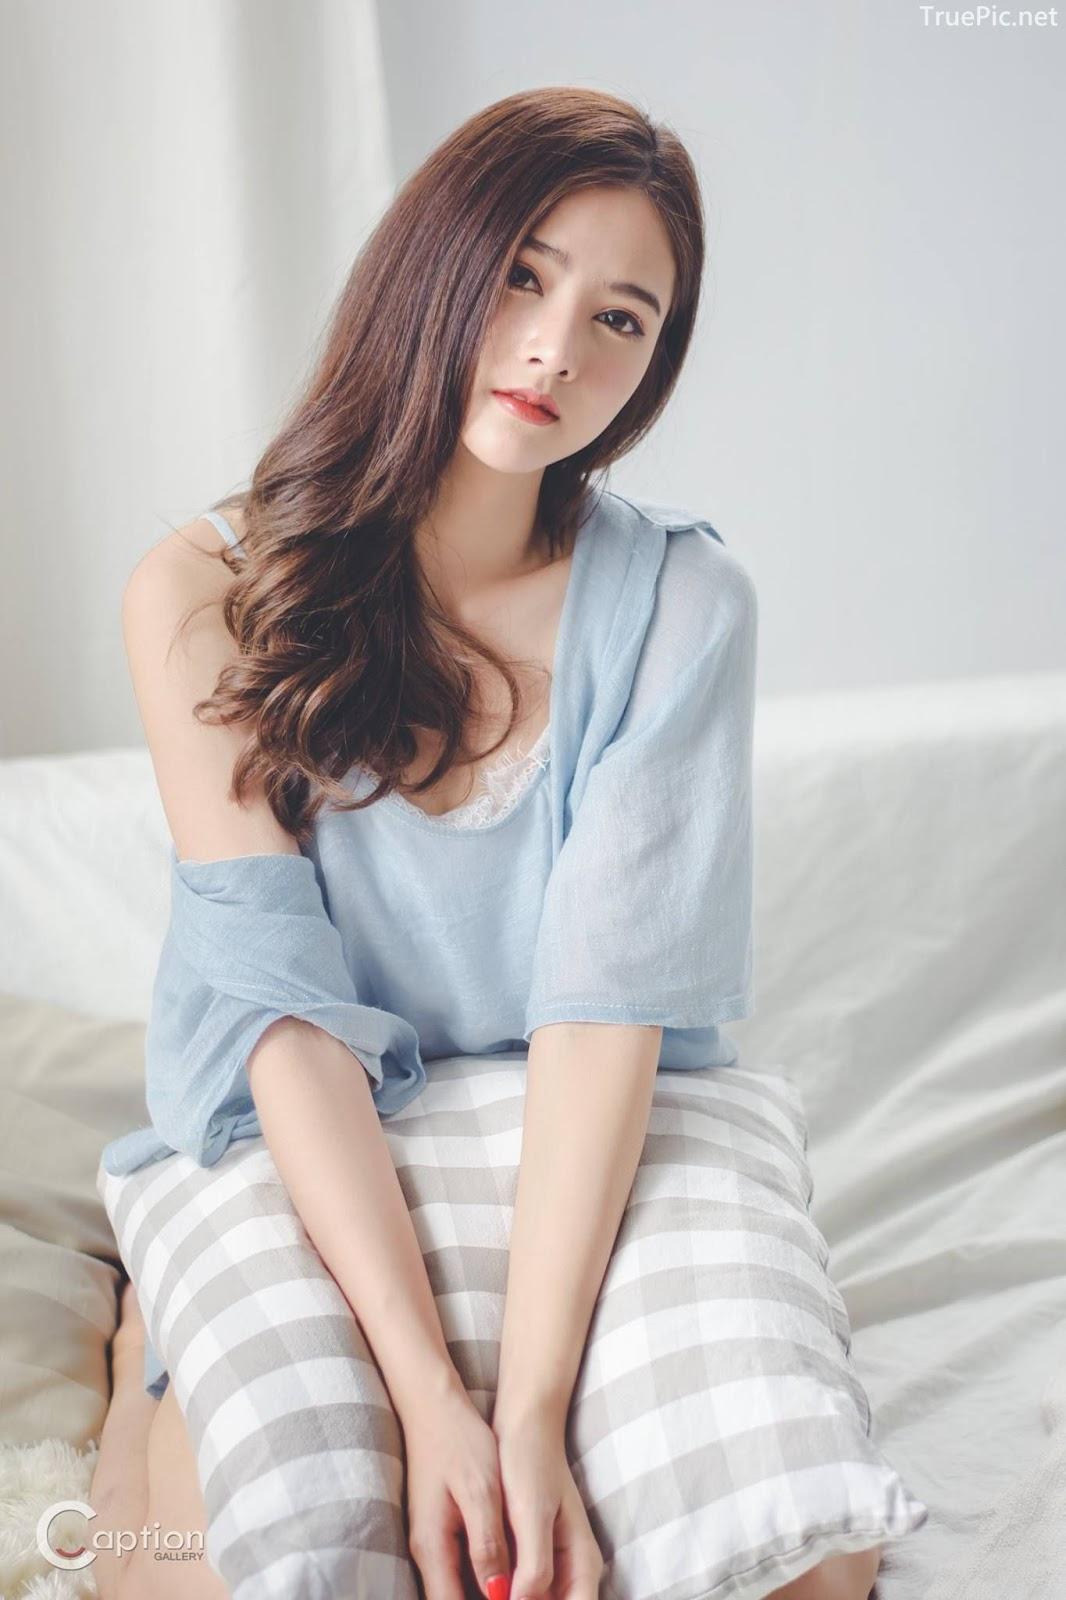 Thailand pretty girl Aintoaon Nantawong - Photo album Beautiful Morning Monday - Picture 4